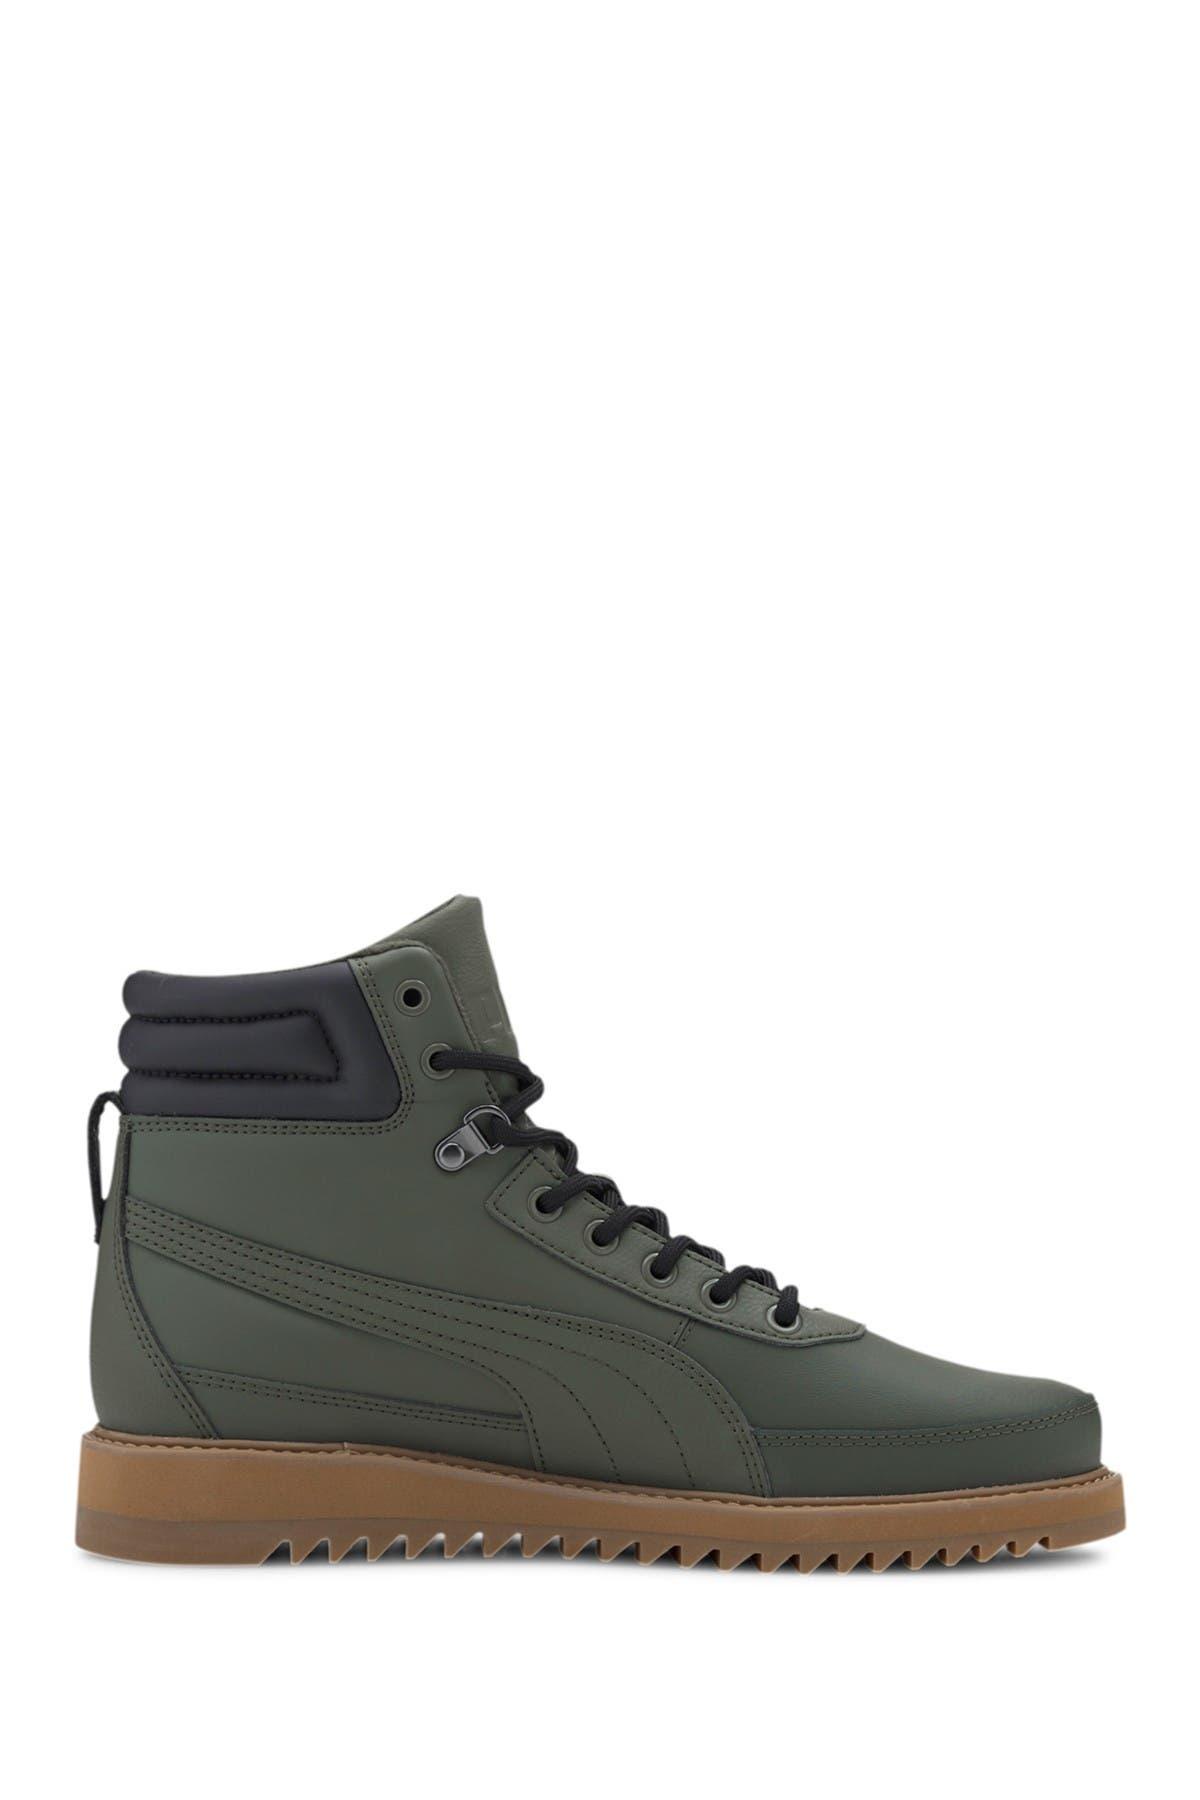 Image of PUMA Desierto V2 Sneaker